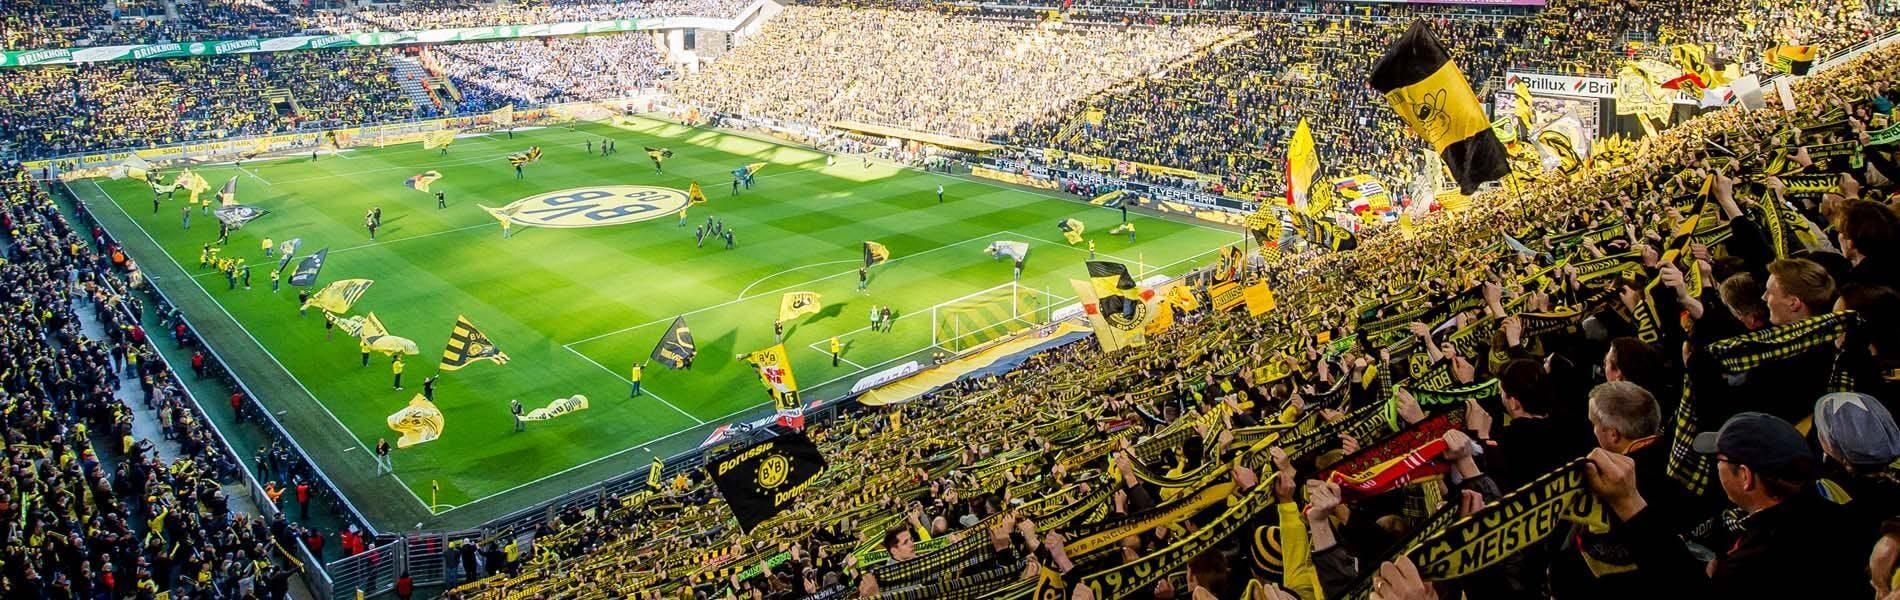 Besten Bundesliga - 386458